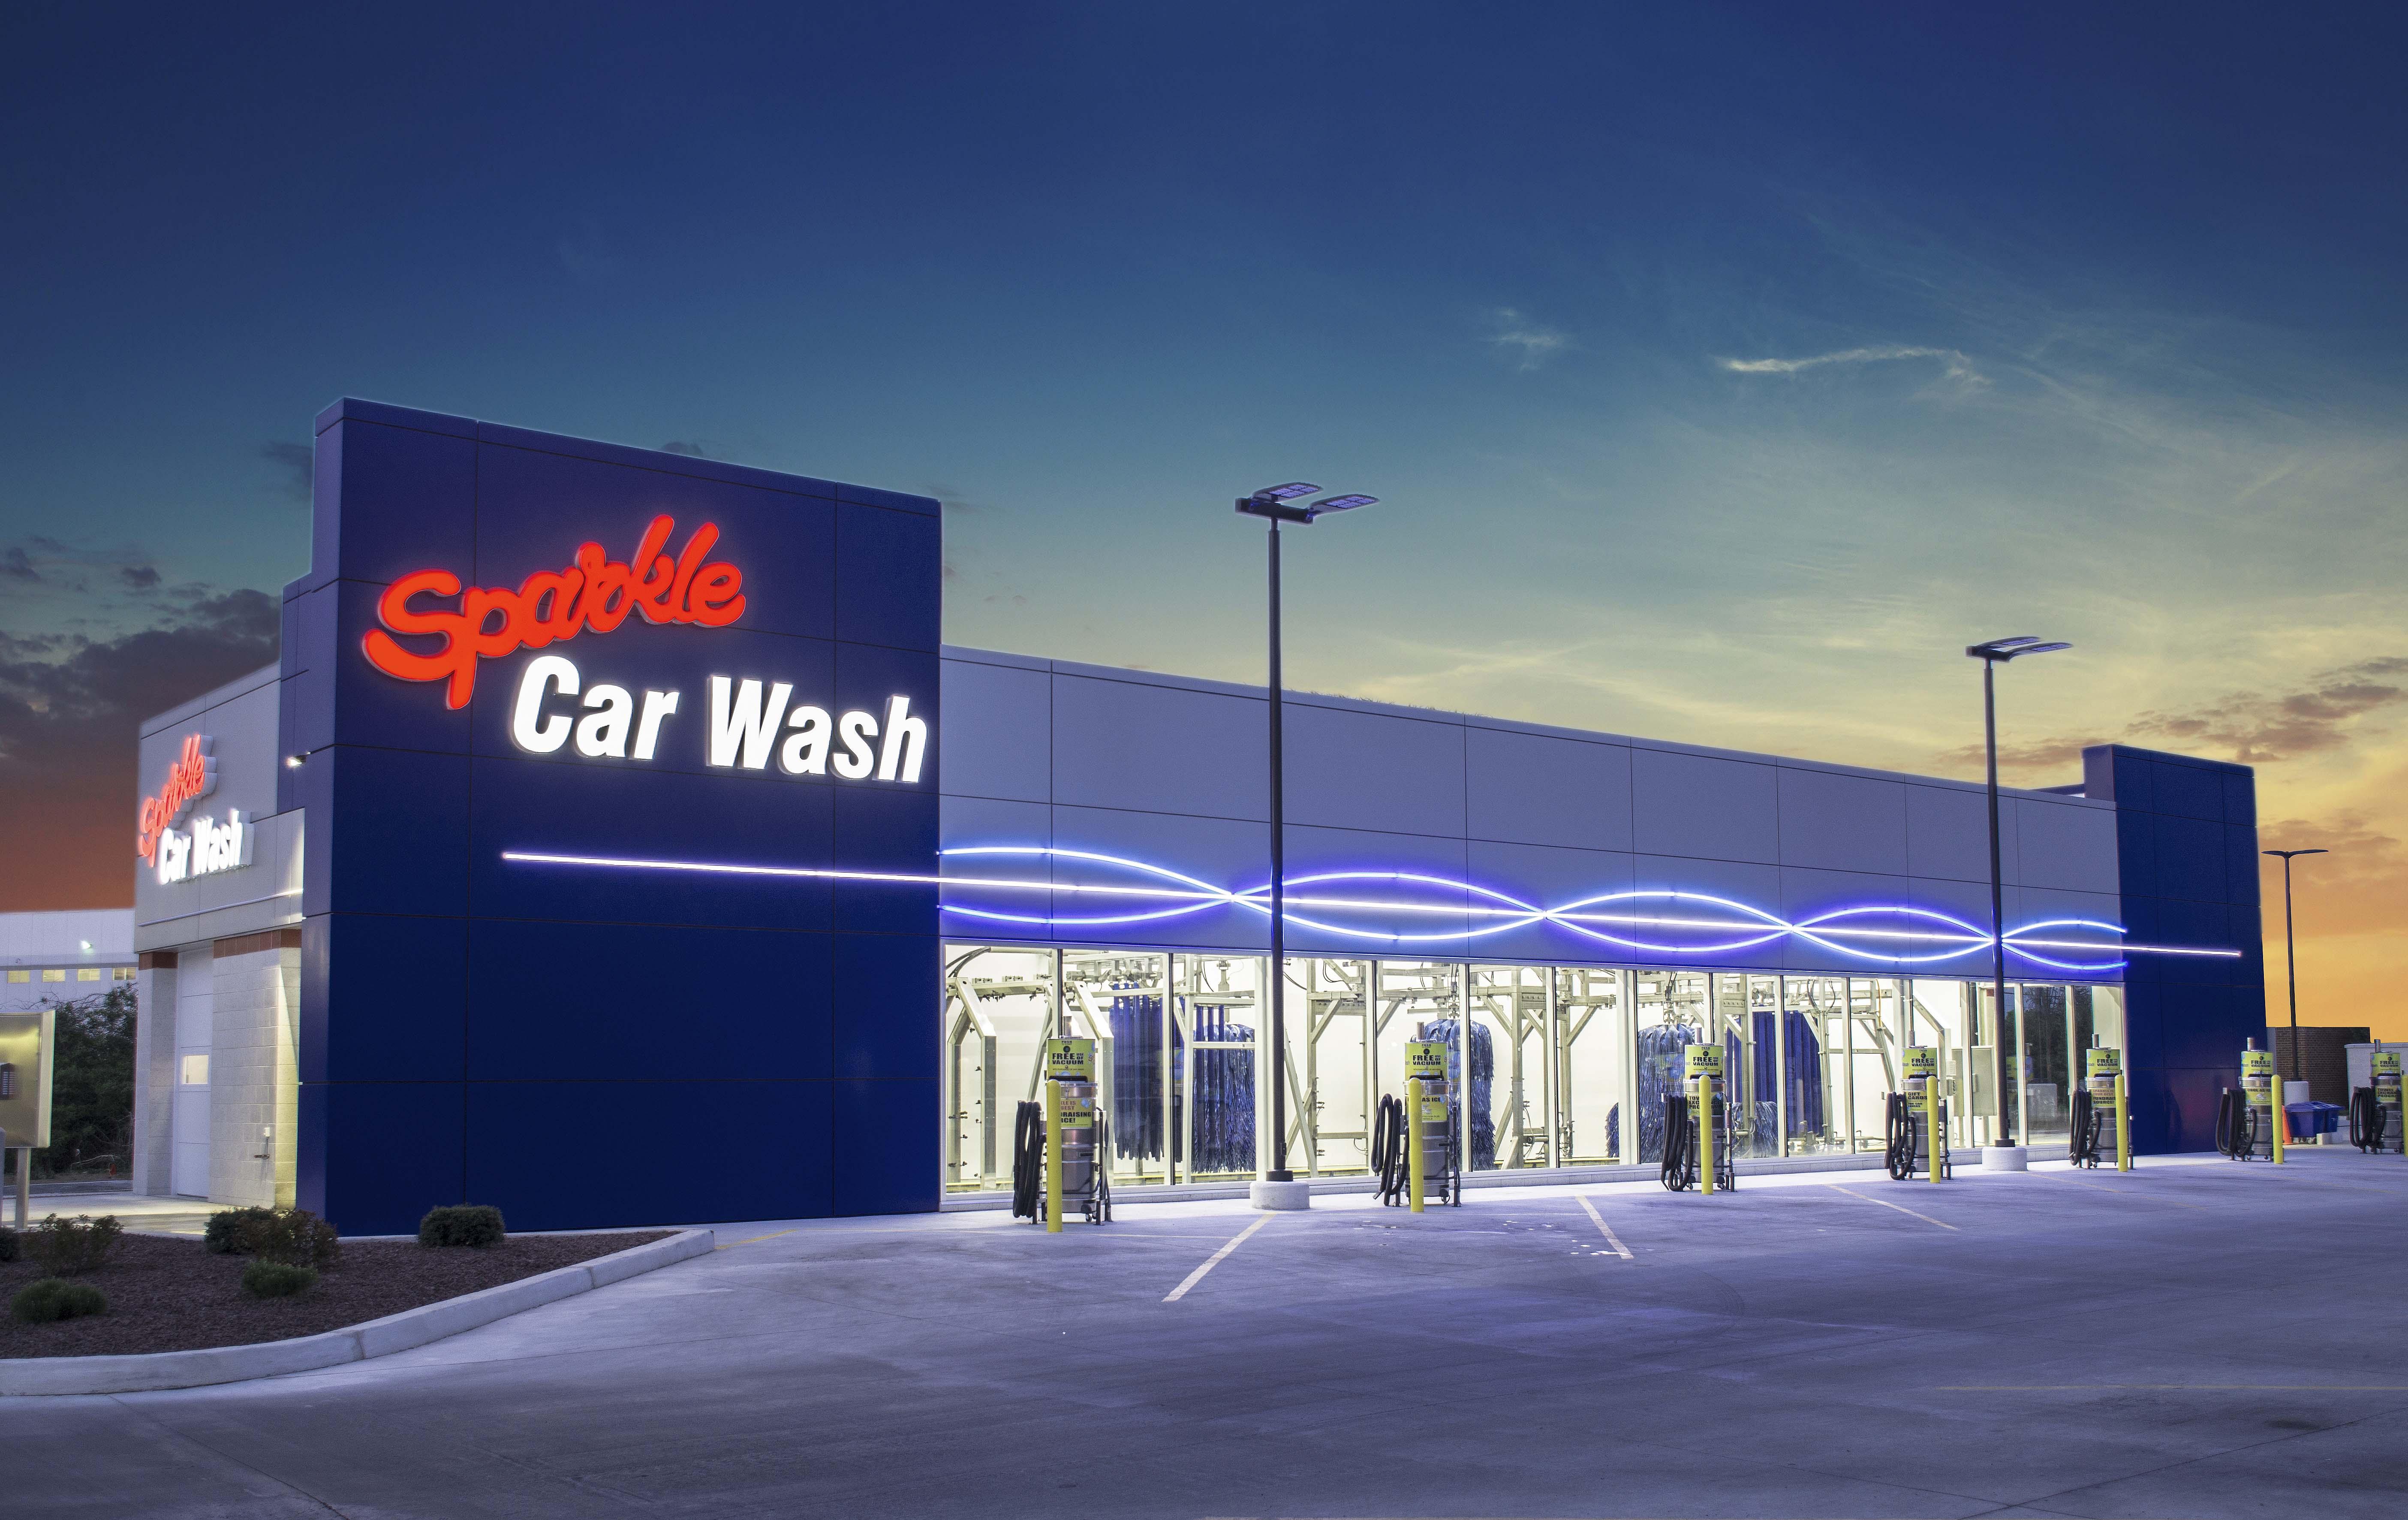 sparkle car wash